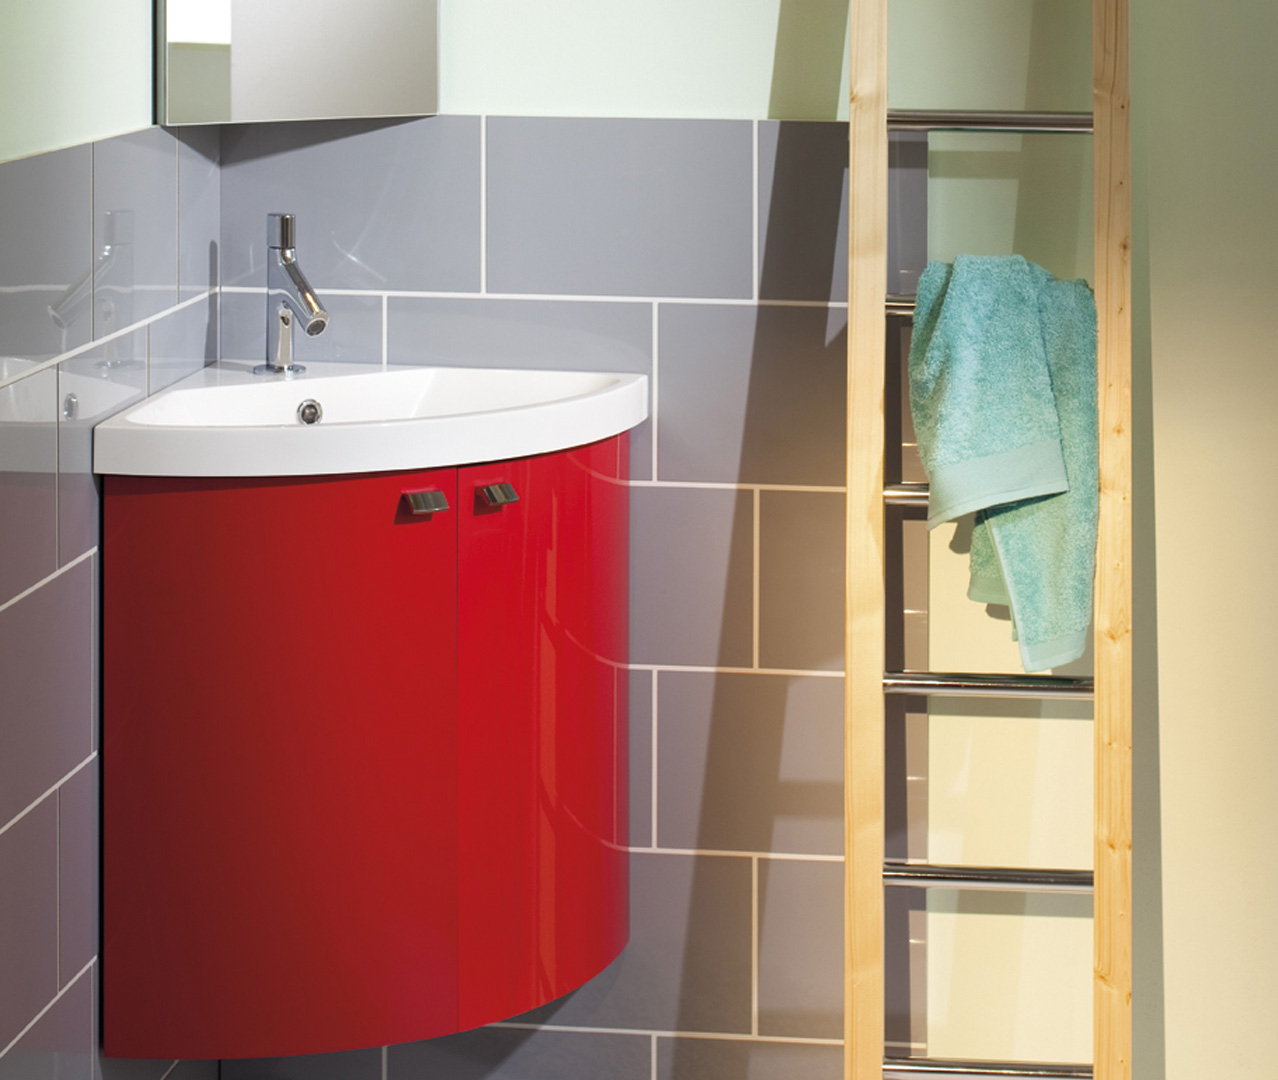 Vasque D Angle De Salle De Bain gamme pop, petit meuble de salle de bain - sanijura